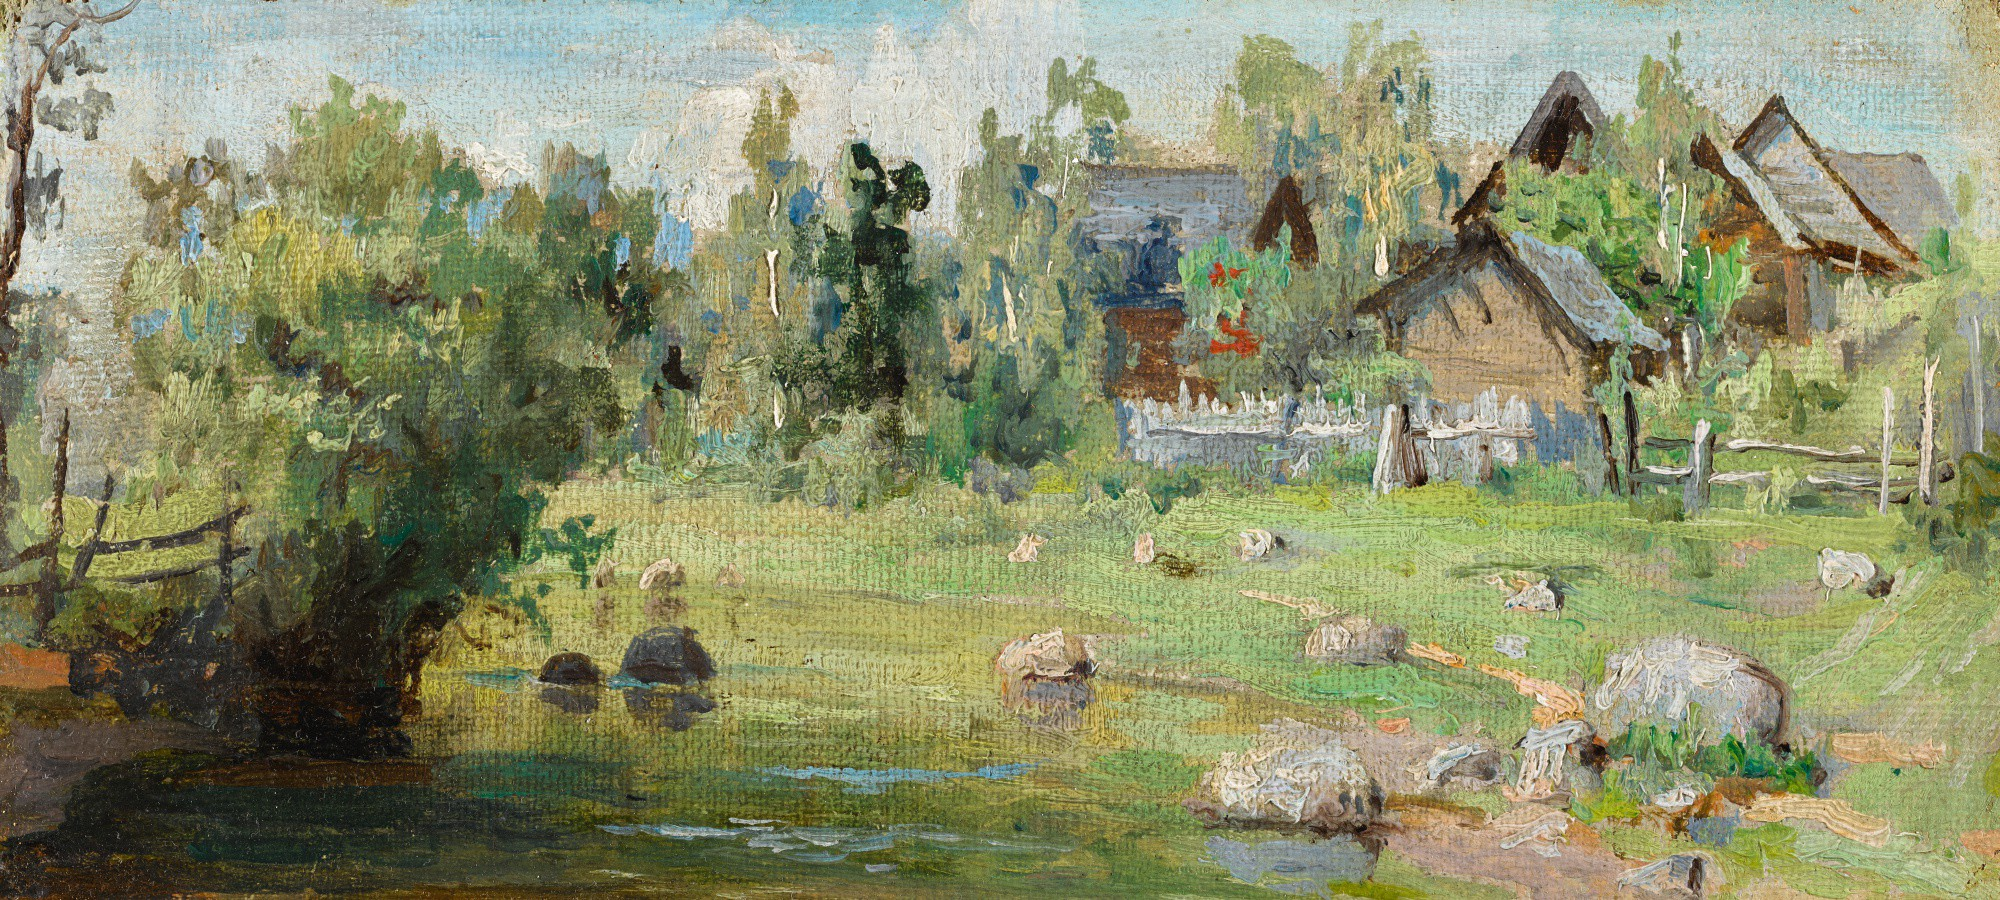 VASILY DMITRIEVICH POLENOV | OUTSKIRTS OF THE VILLAGE